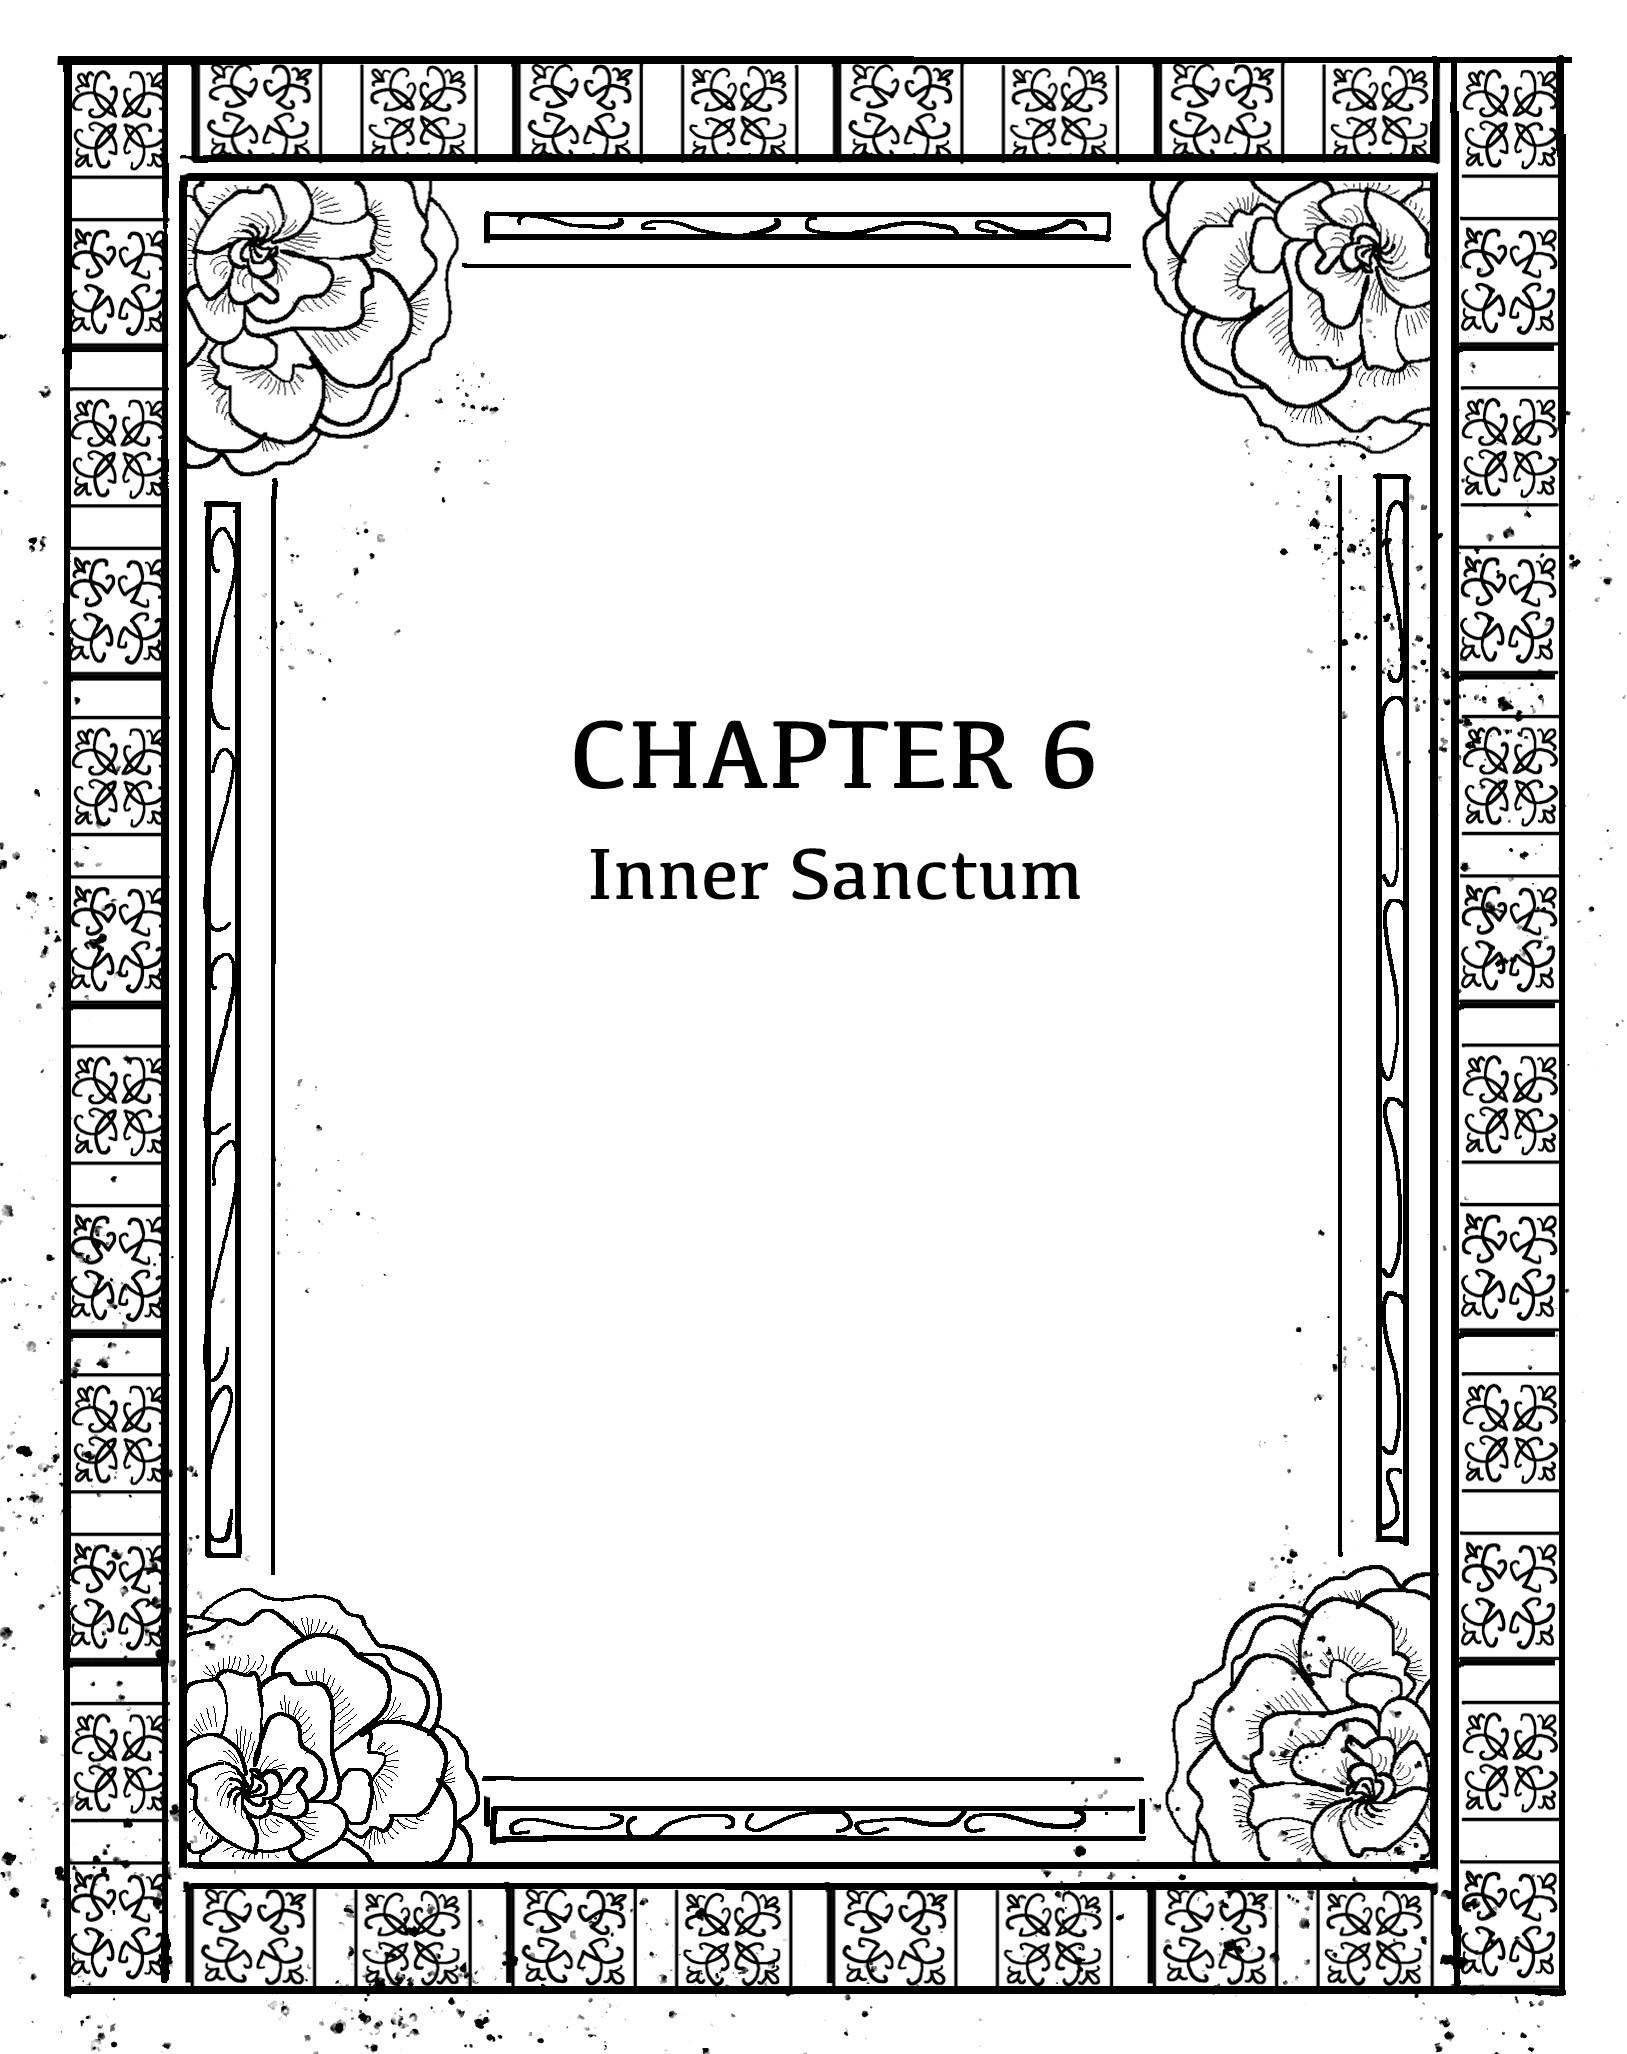 Amnesia_ChapterCard_6.jpg